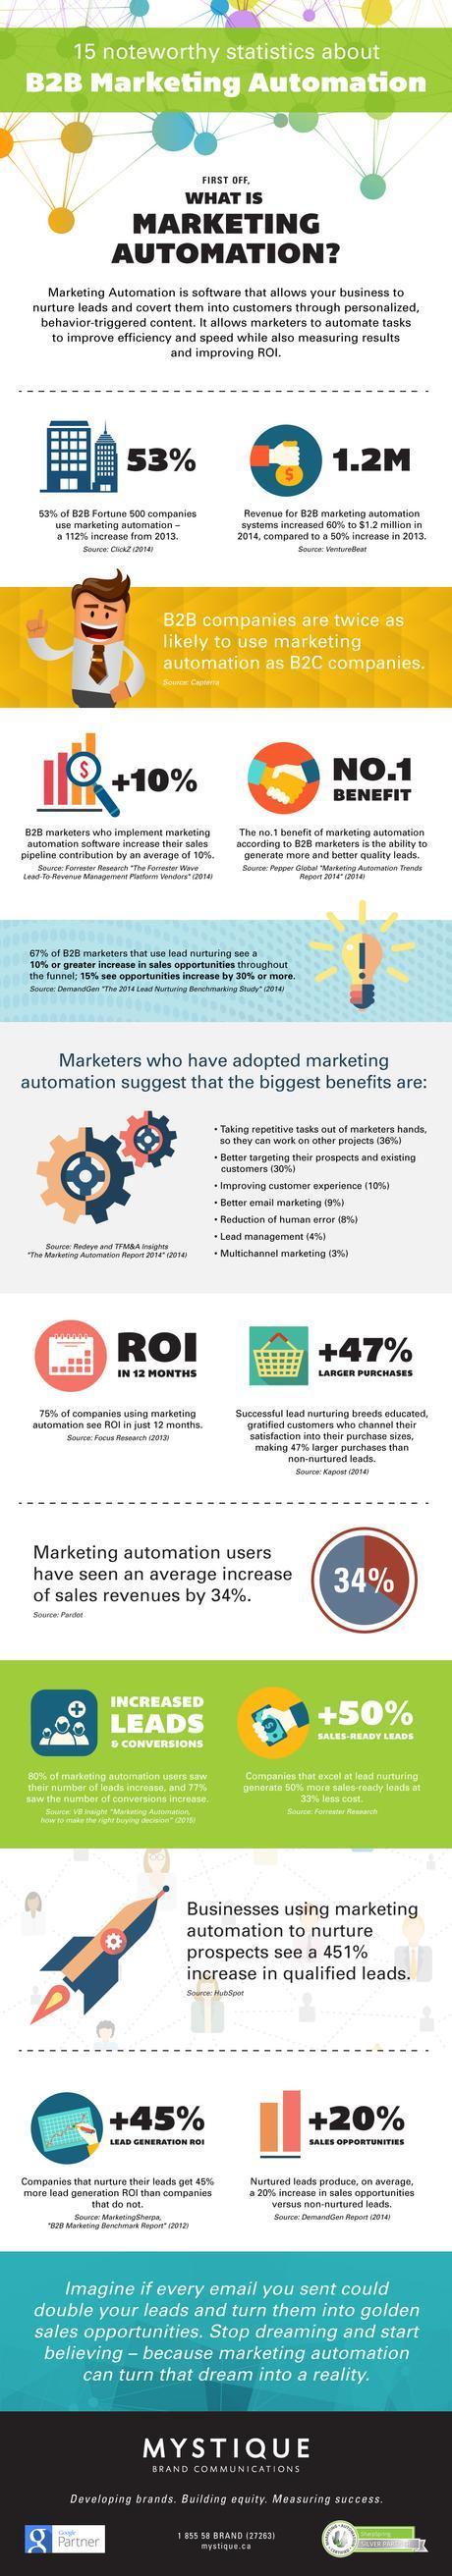 Infographic: 15 noteworthy statistics about B2B Marketing Automation